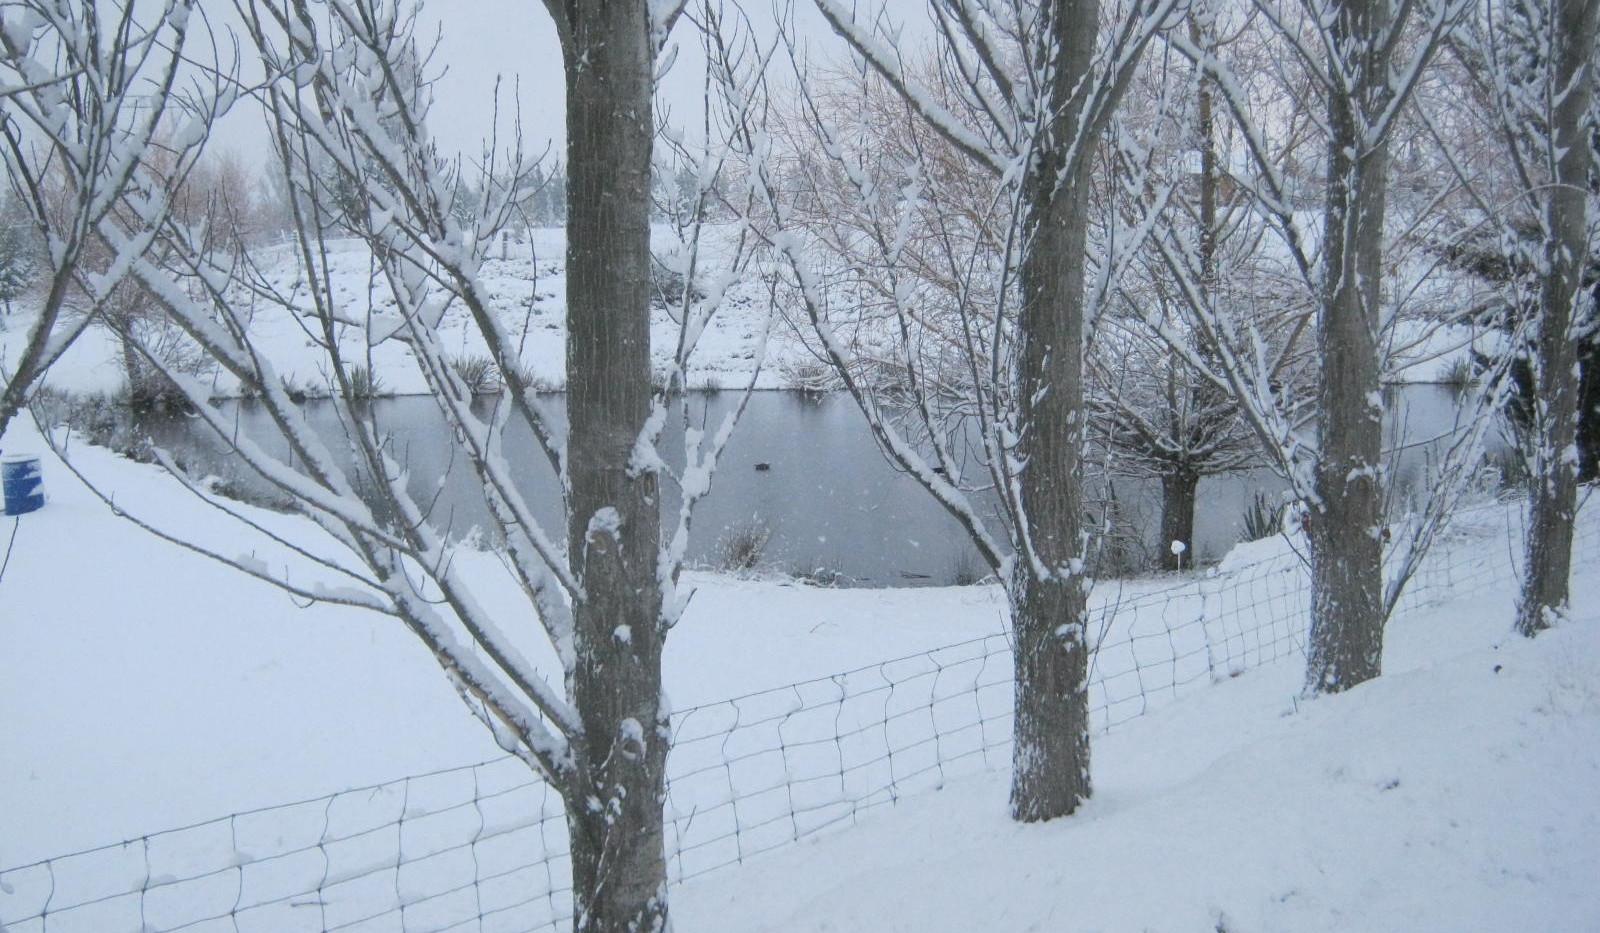 Irrigation dam in snow